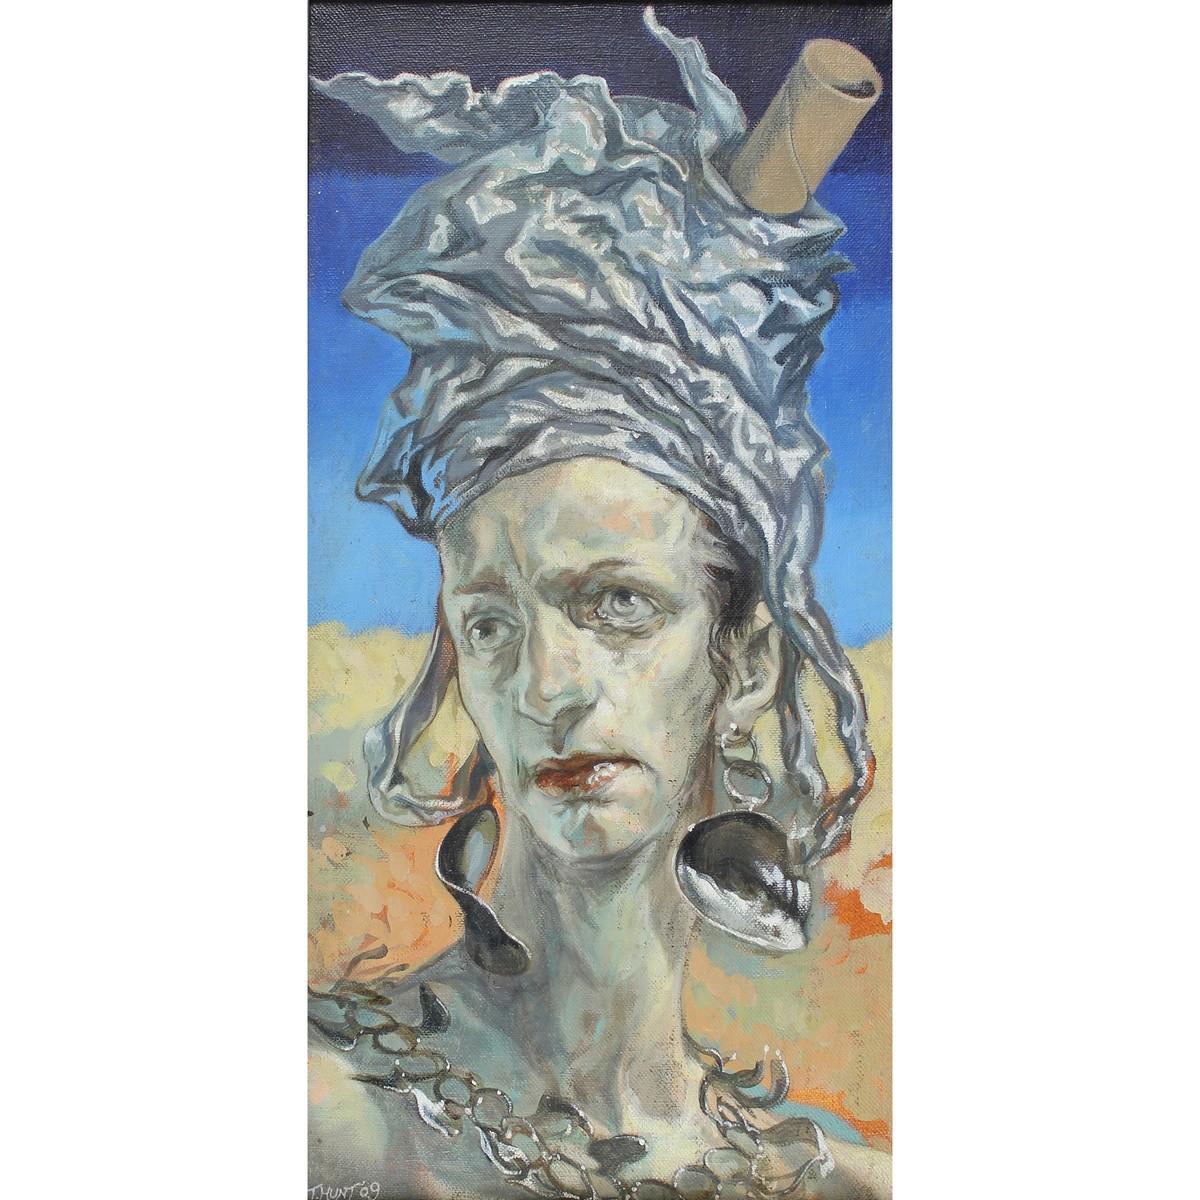 Lot 38 - Hunt, Toby 1976 - 2018? British AR, Woman with Wild Headgear